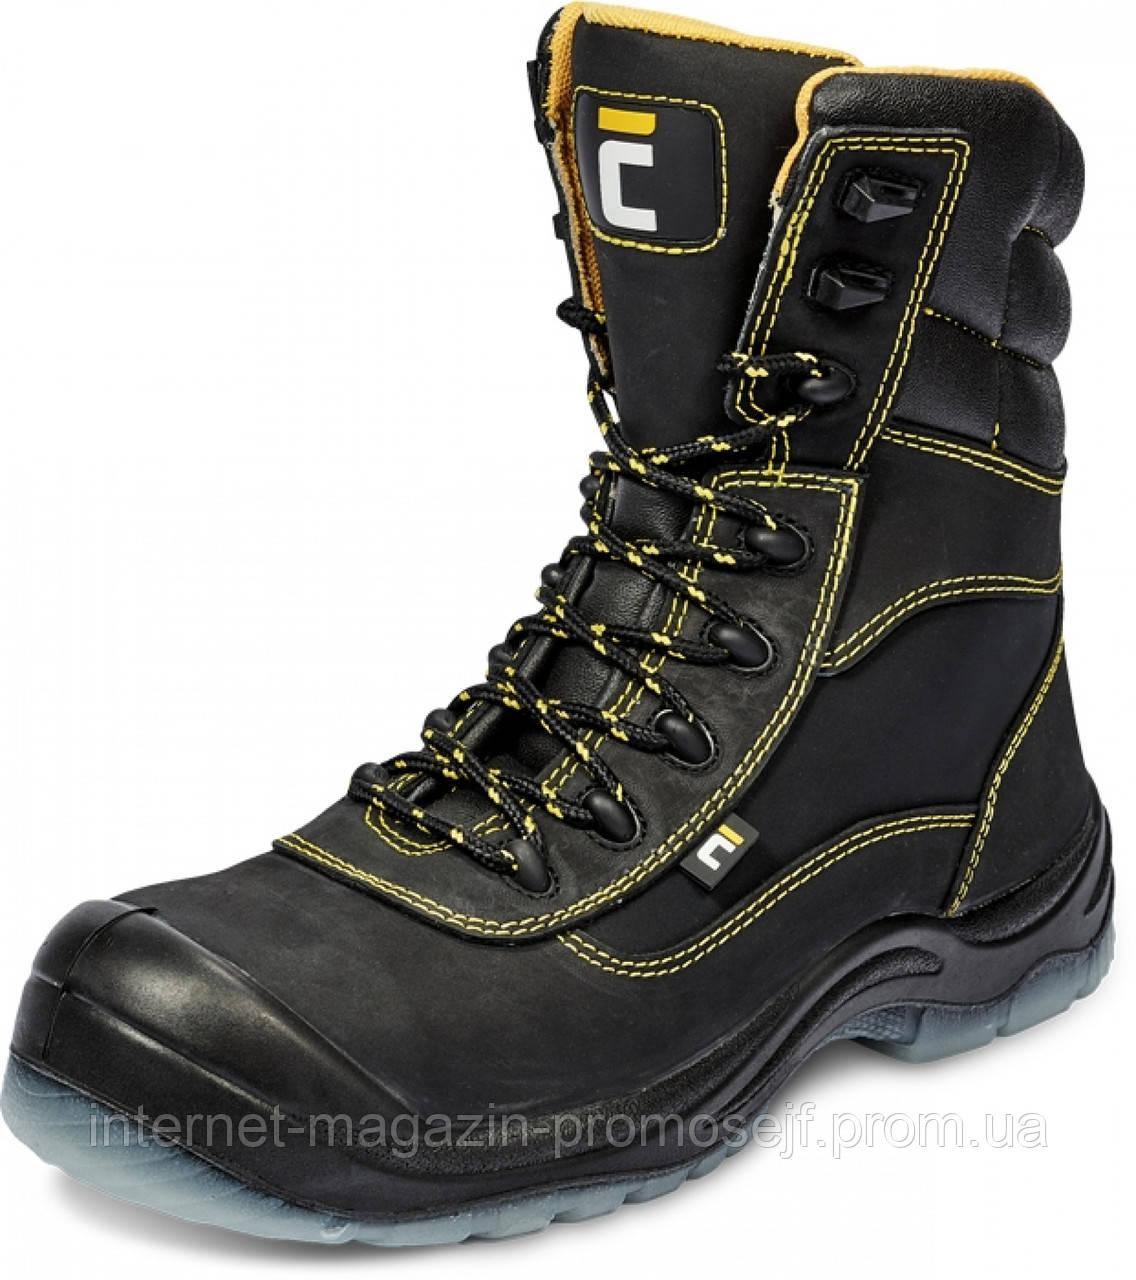 Ботинки зимние защитные с берцами BK TPU MF S3 CI SRC